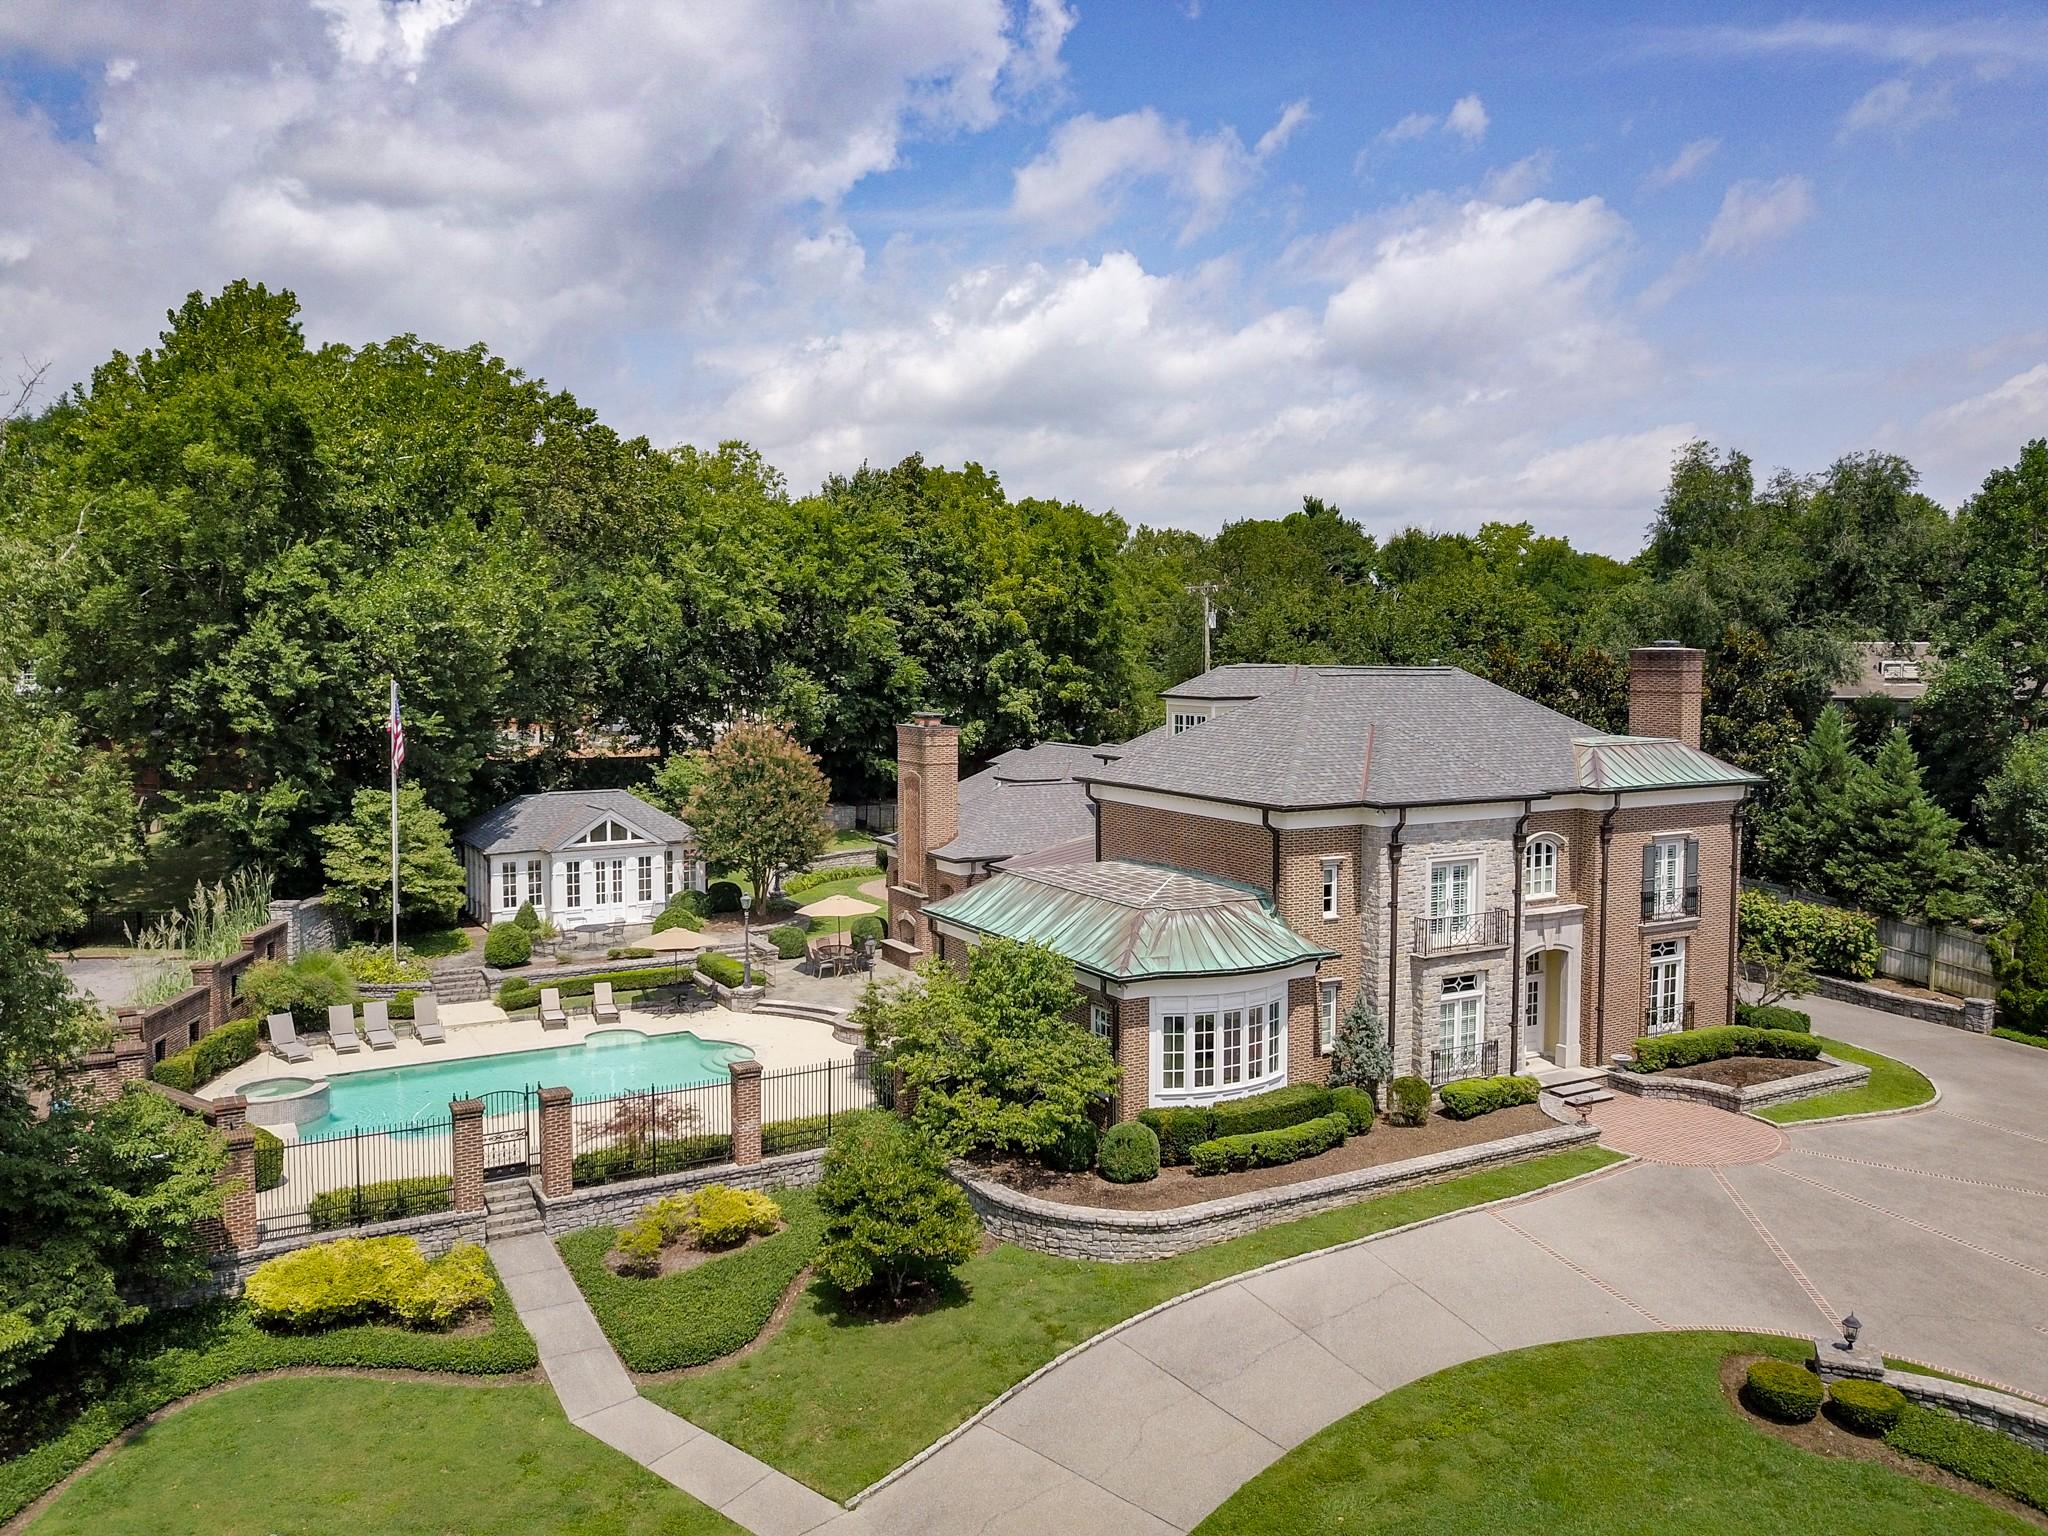 2804 Wimbledon Rd, Nashville, TN 37215 - Nashville, TN real estate listing